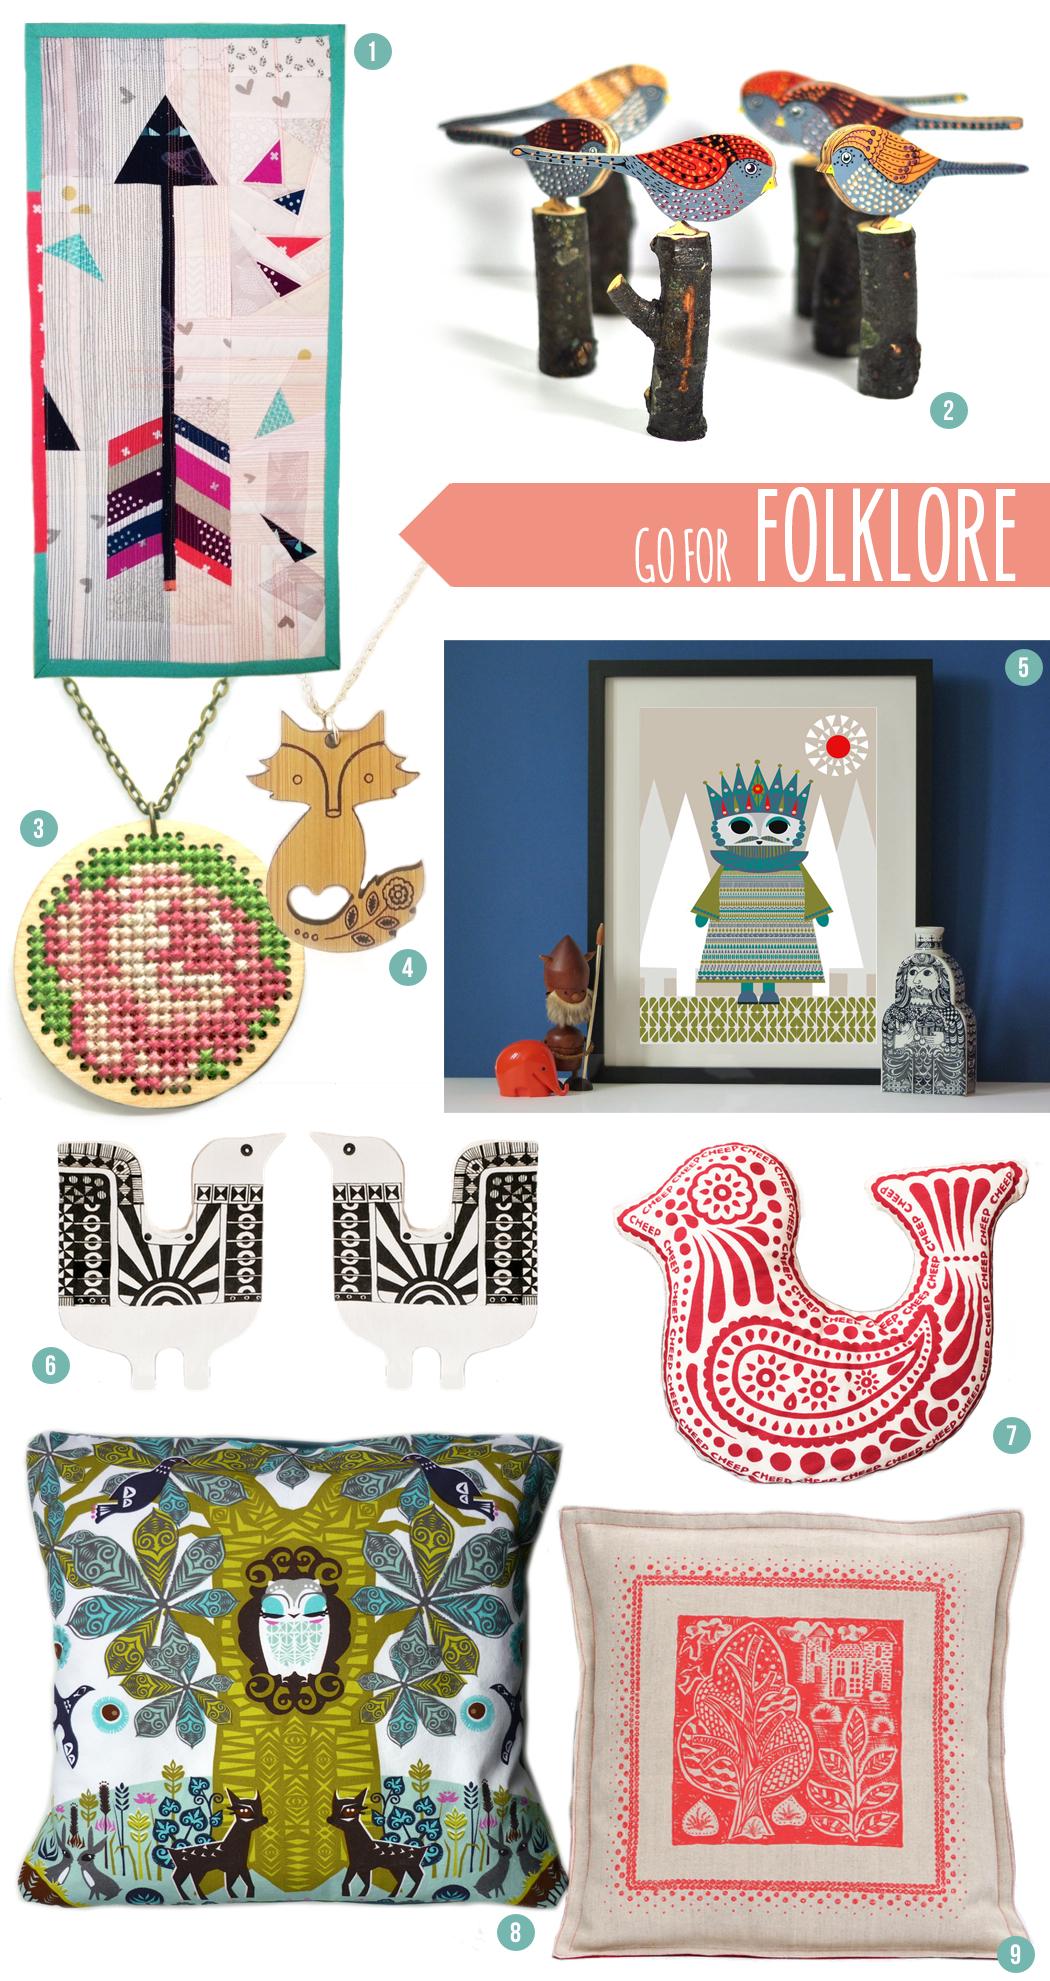 folklore, trend report, scandinavian style, birds, folk art, mollie makes